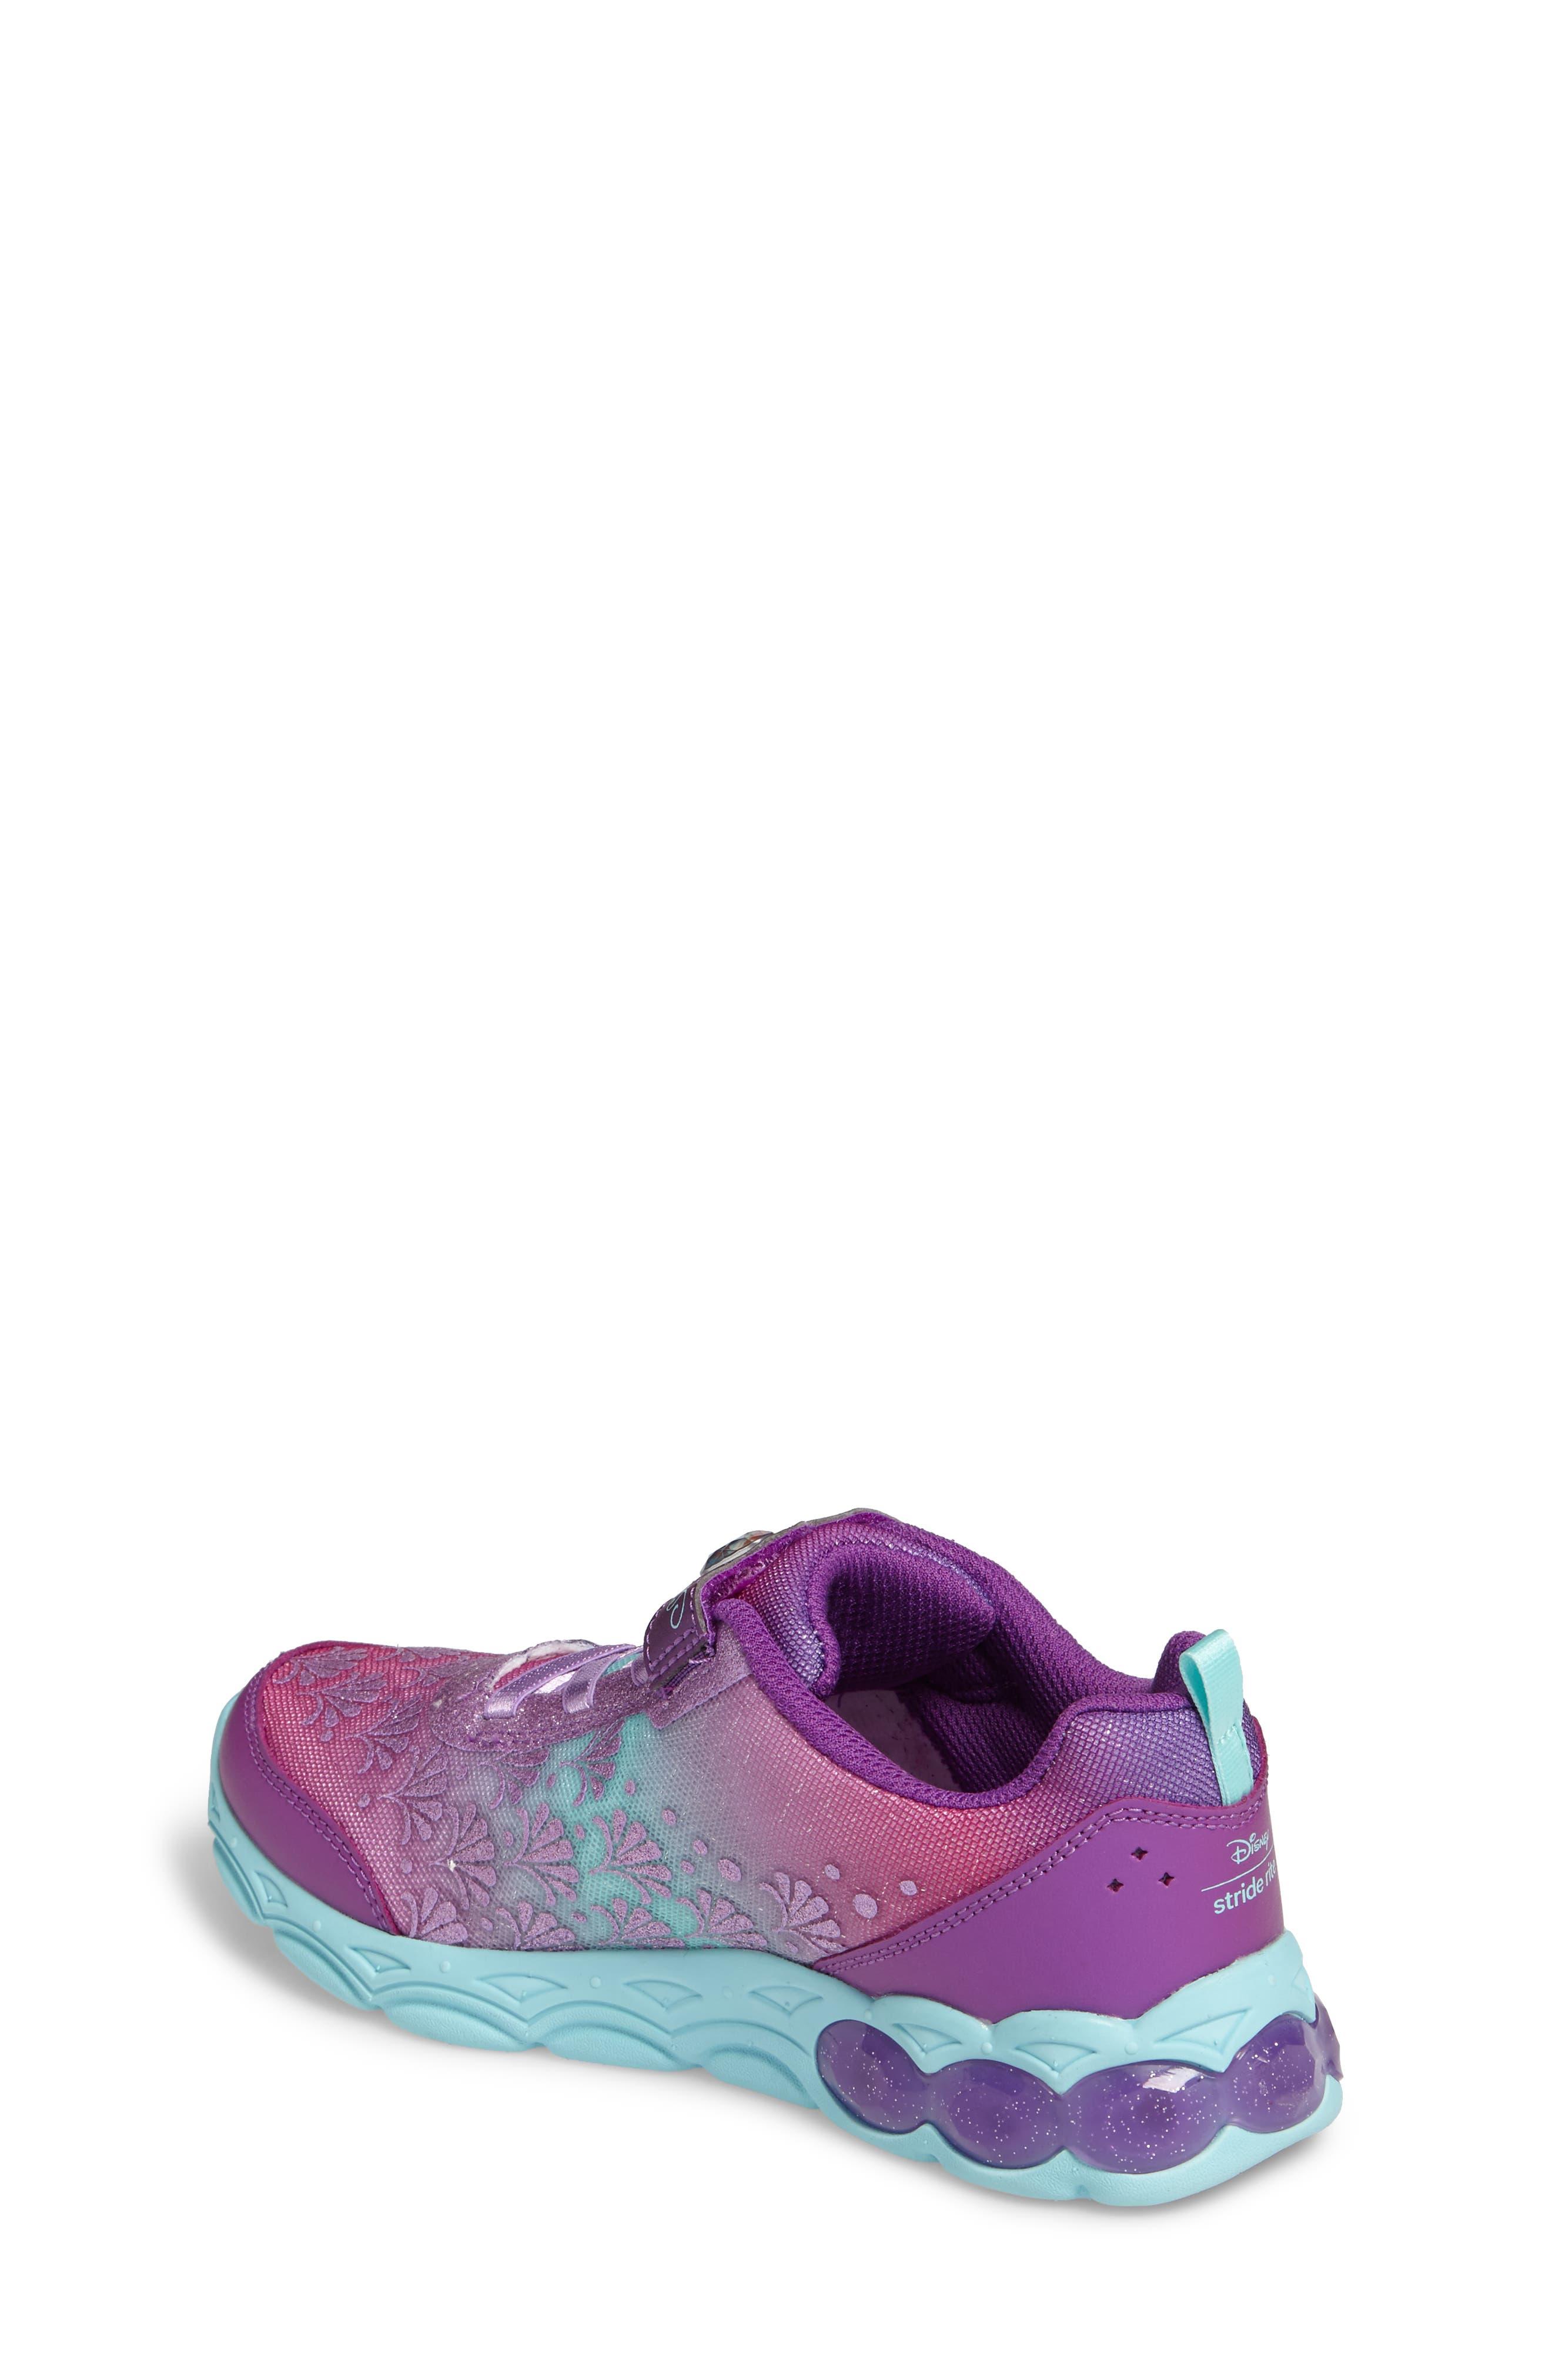 Disney<sup>®</sup> Ariel Ocean Adventurer Light-Up Sneaker,                             Alternate thumbnail 2, color,                             650